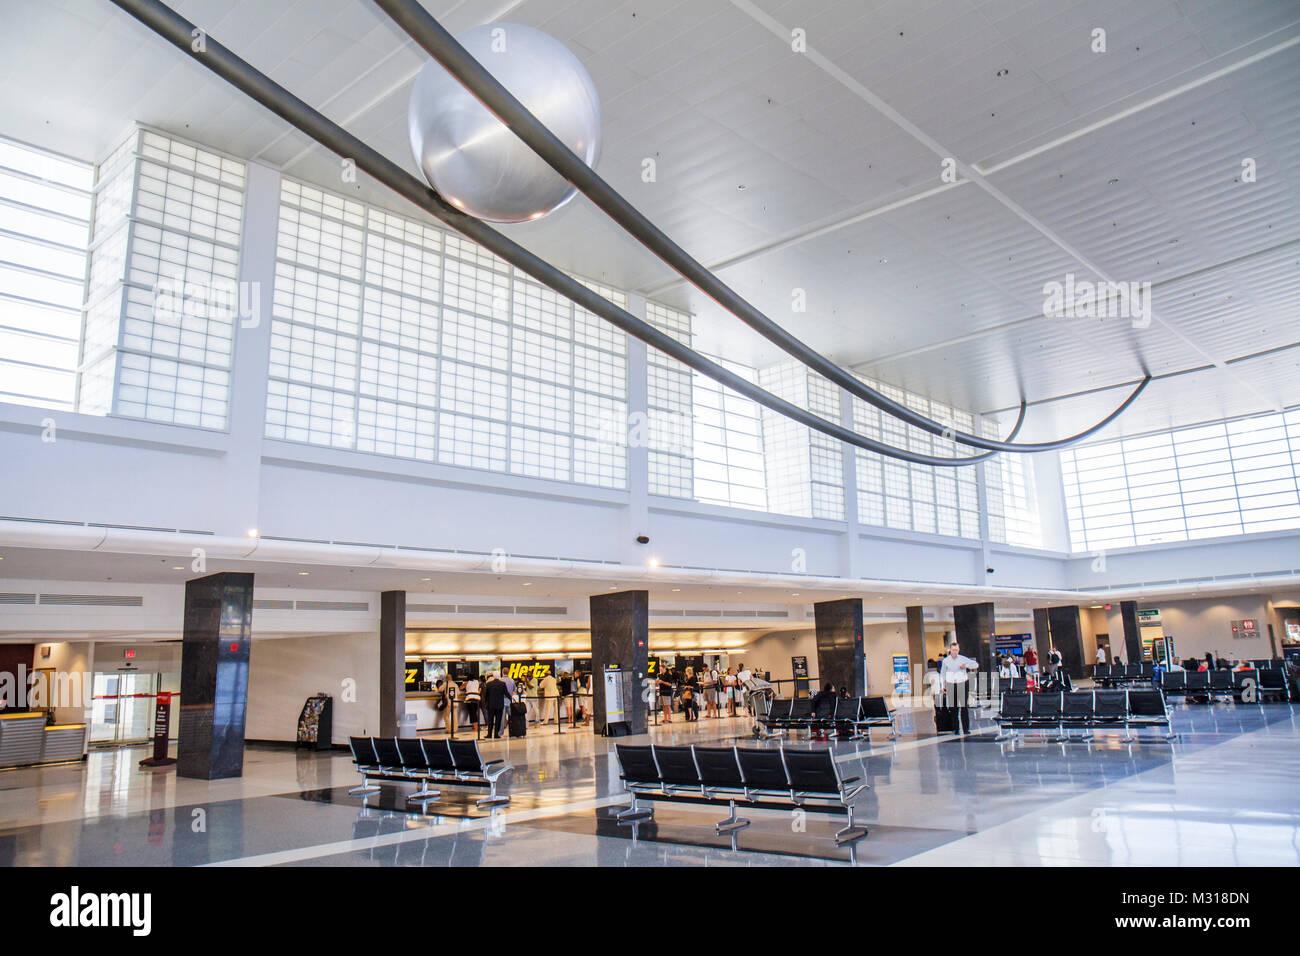 Baltimore Washington International Airport Stock Photos